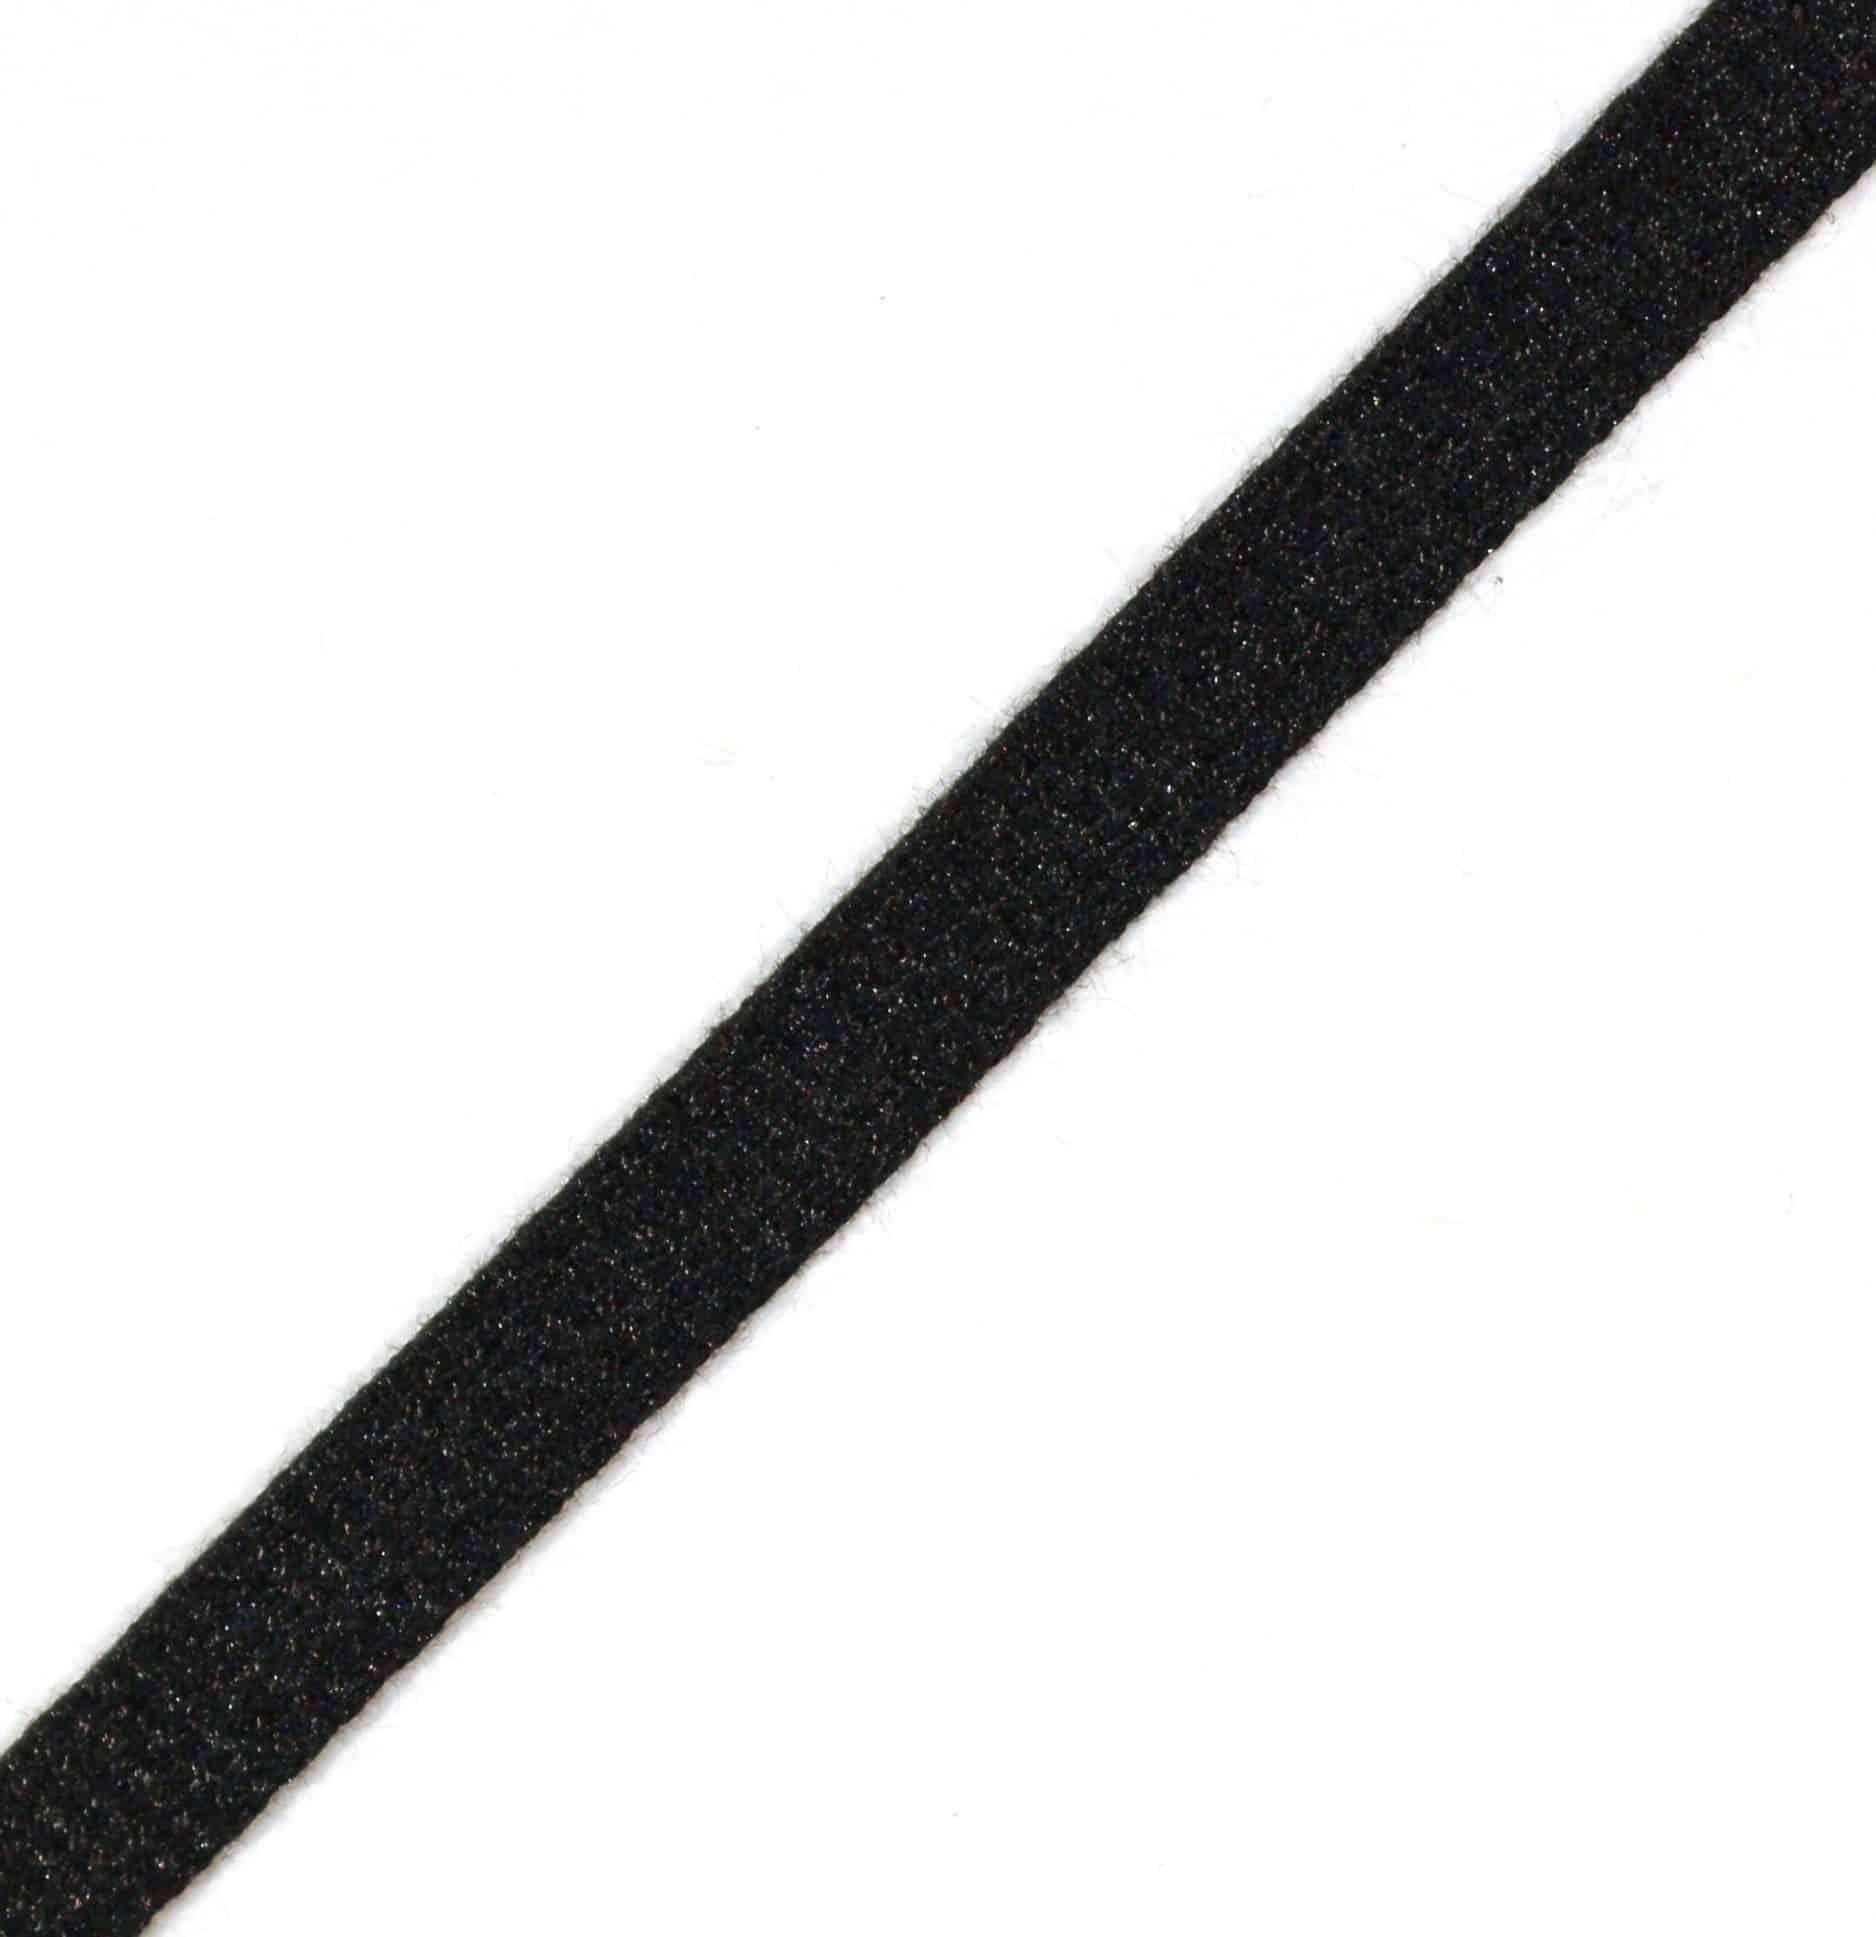 25/32″ Yellow UHMWPE / Polyester webbing